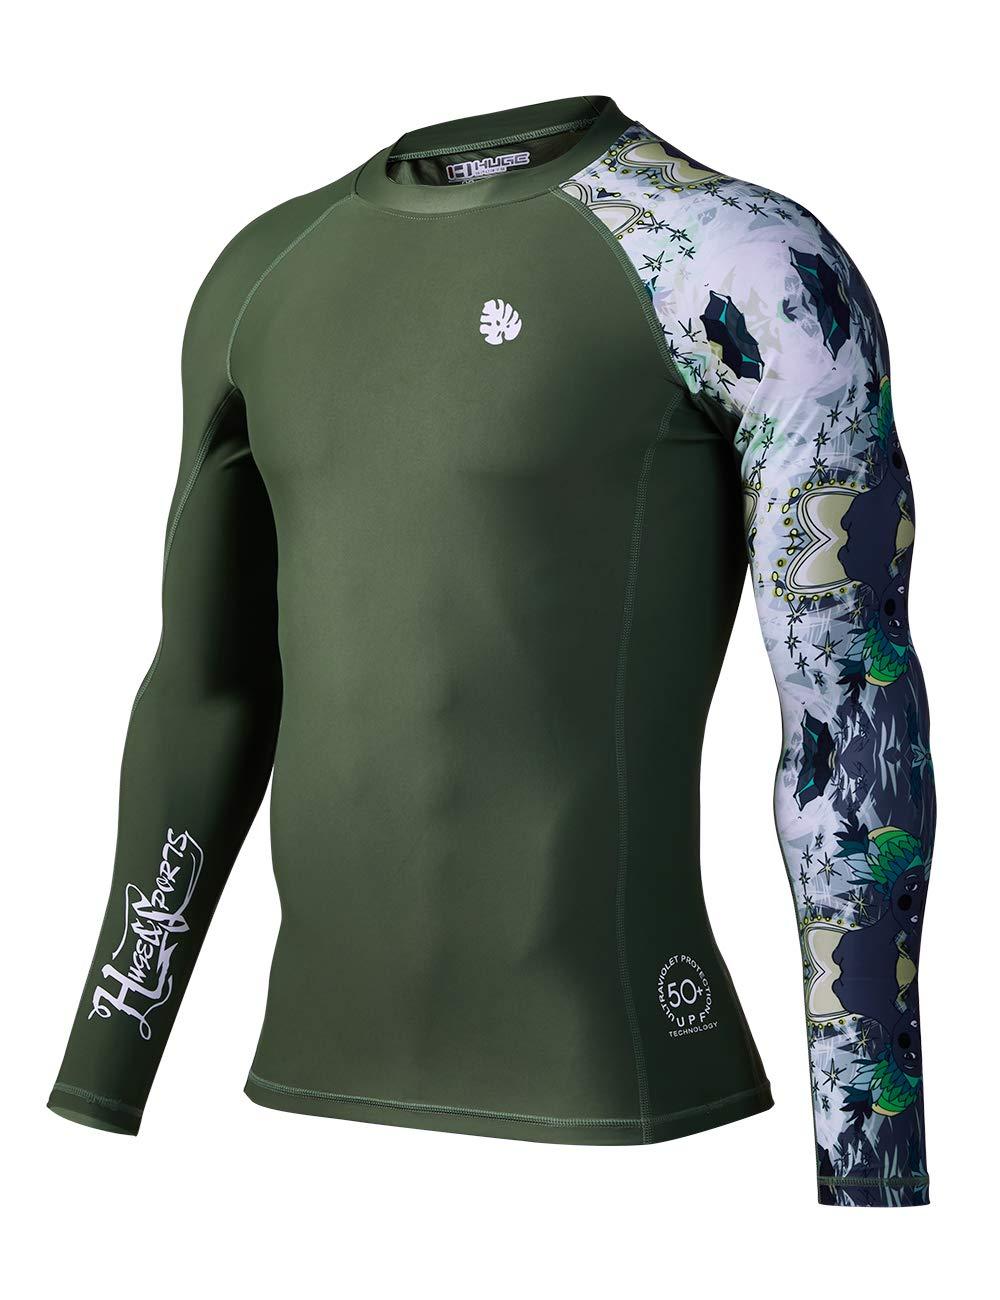 HUGE SPORTS Men's Splice UV Sun Protection UPF 50+ Skins Rash Guard Long Sleeves ... by HUGE SPORTS